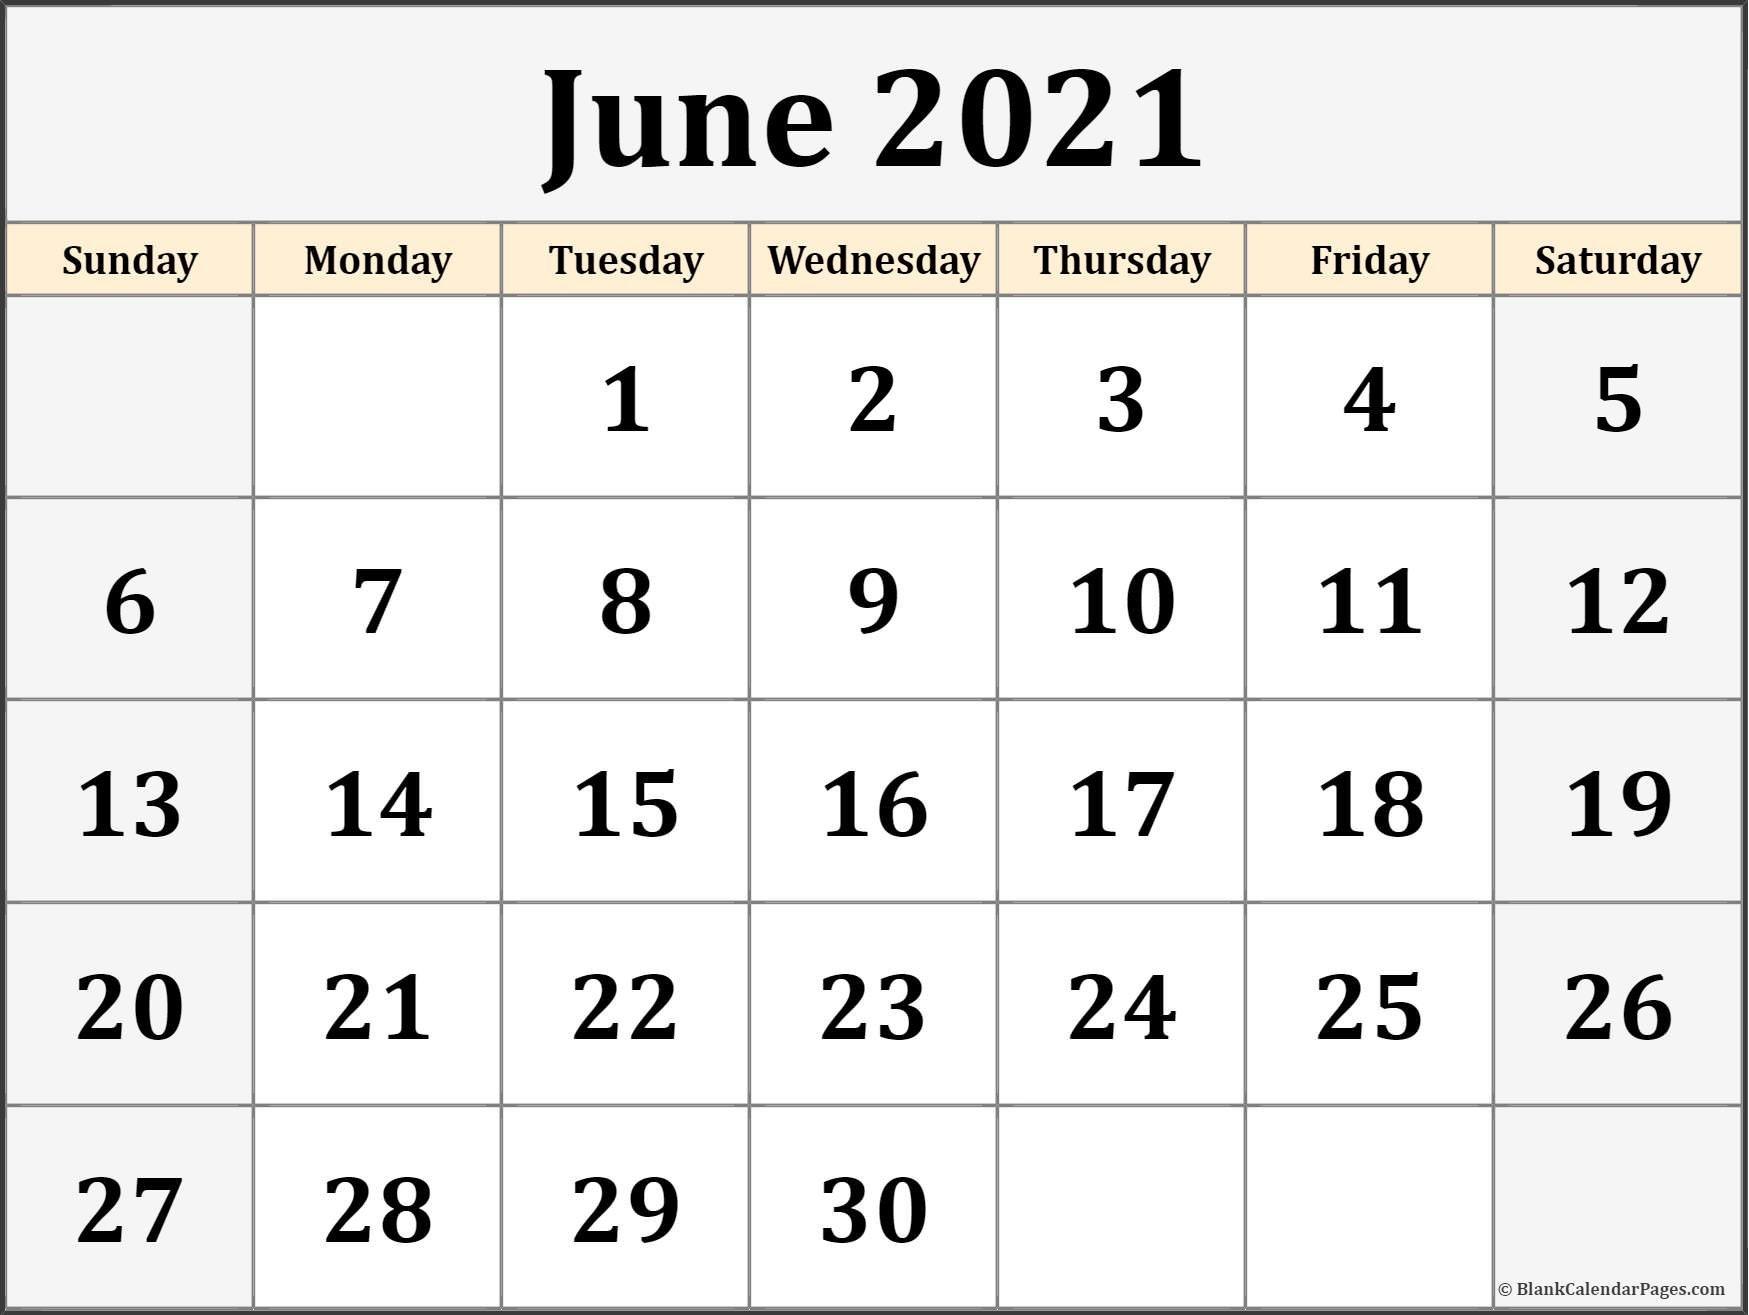 June 2021 Calendar | Free Printable Monthly Calendars Image Of Month Calendar